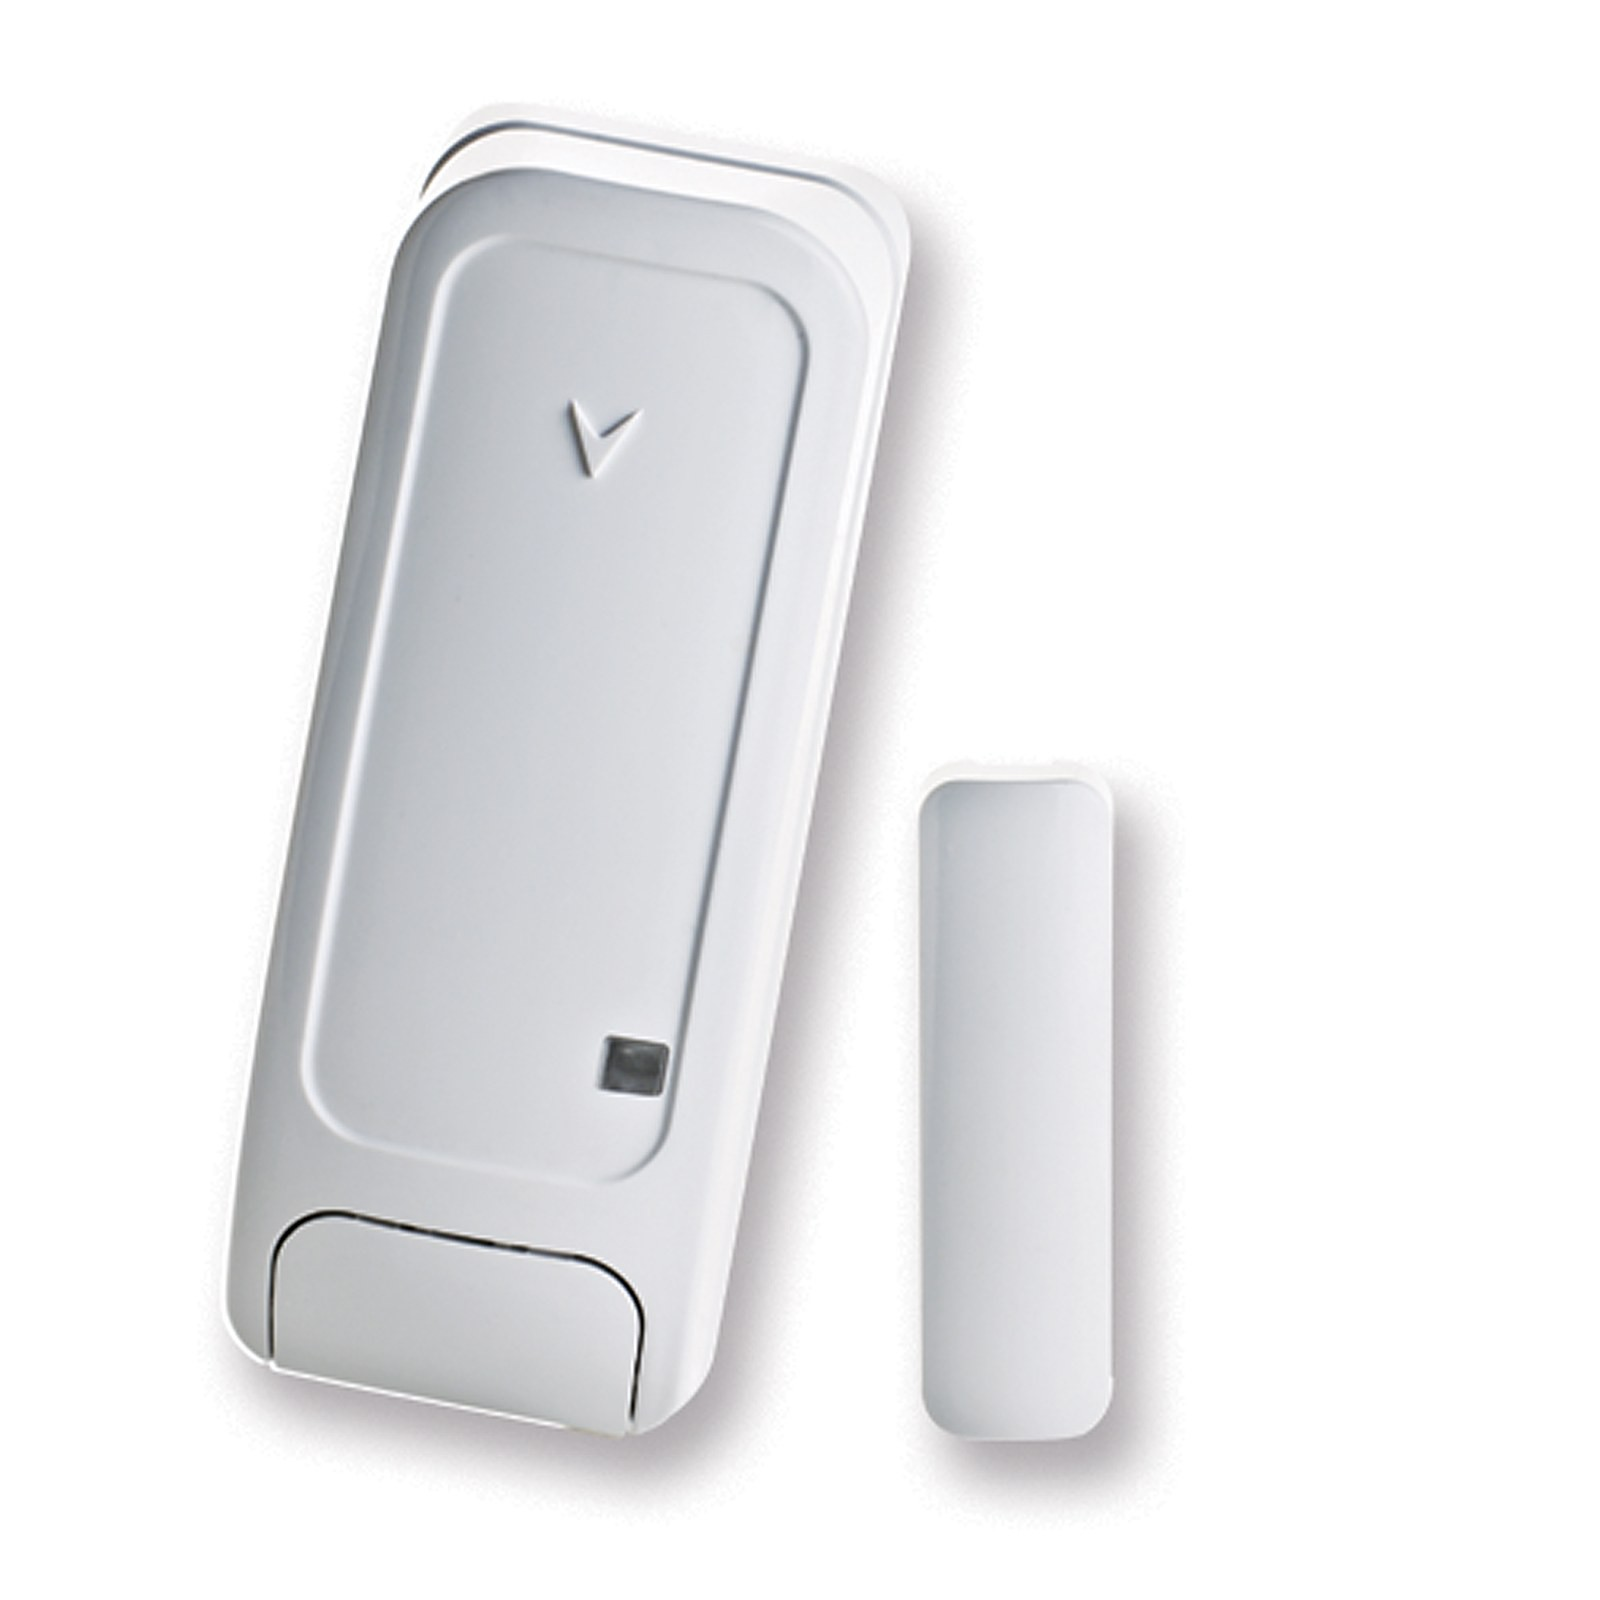 Kit Antifurto Allarme Wireless Telecamera BENTEL BW30 ...